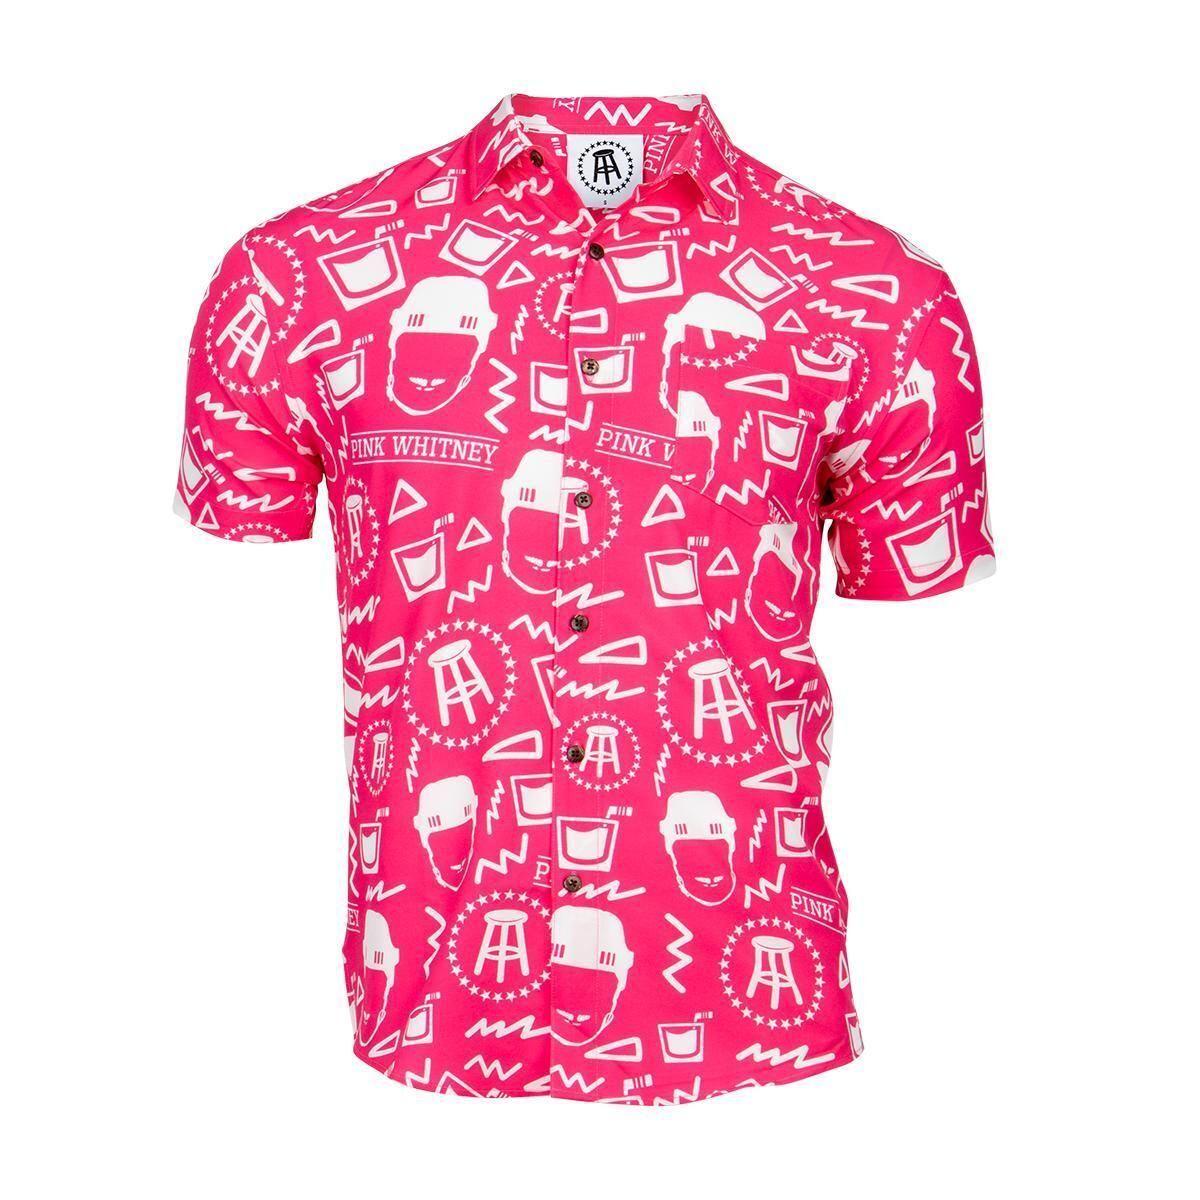 Tropical Bros X Pink Whitney Hawaiian Shirt